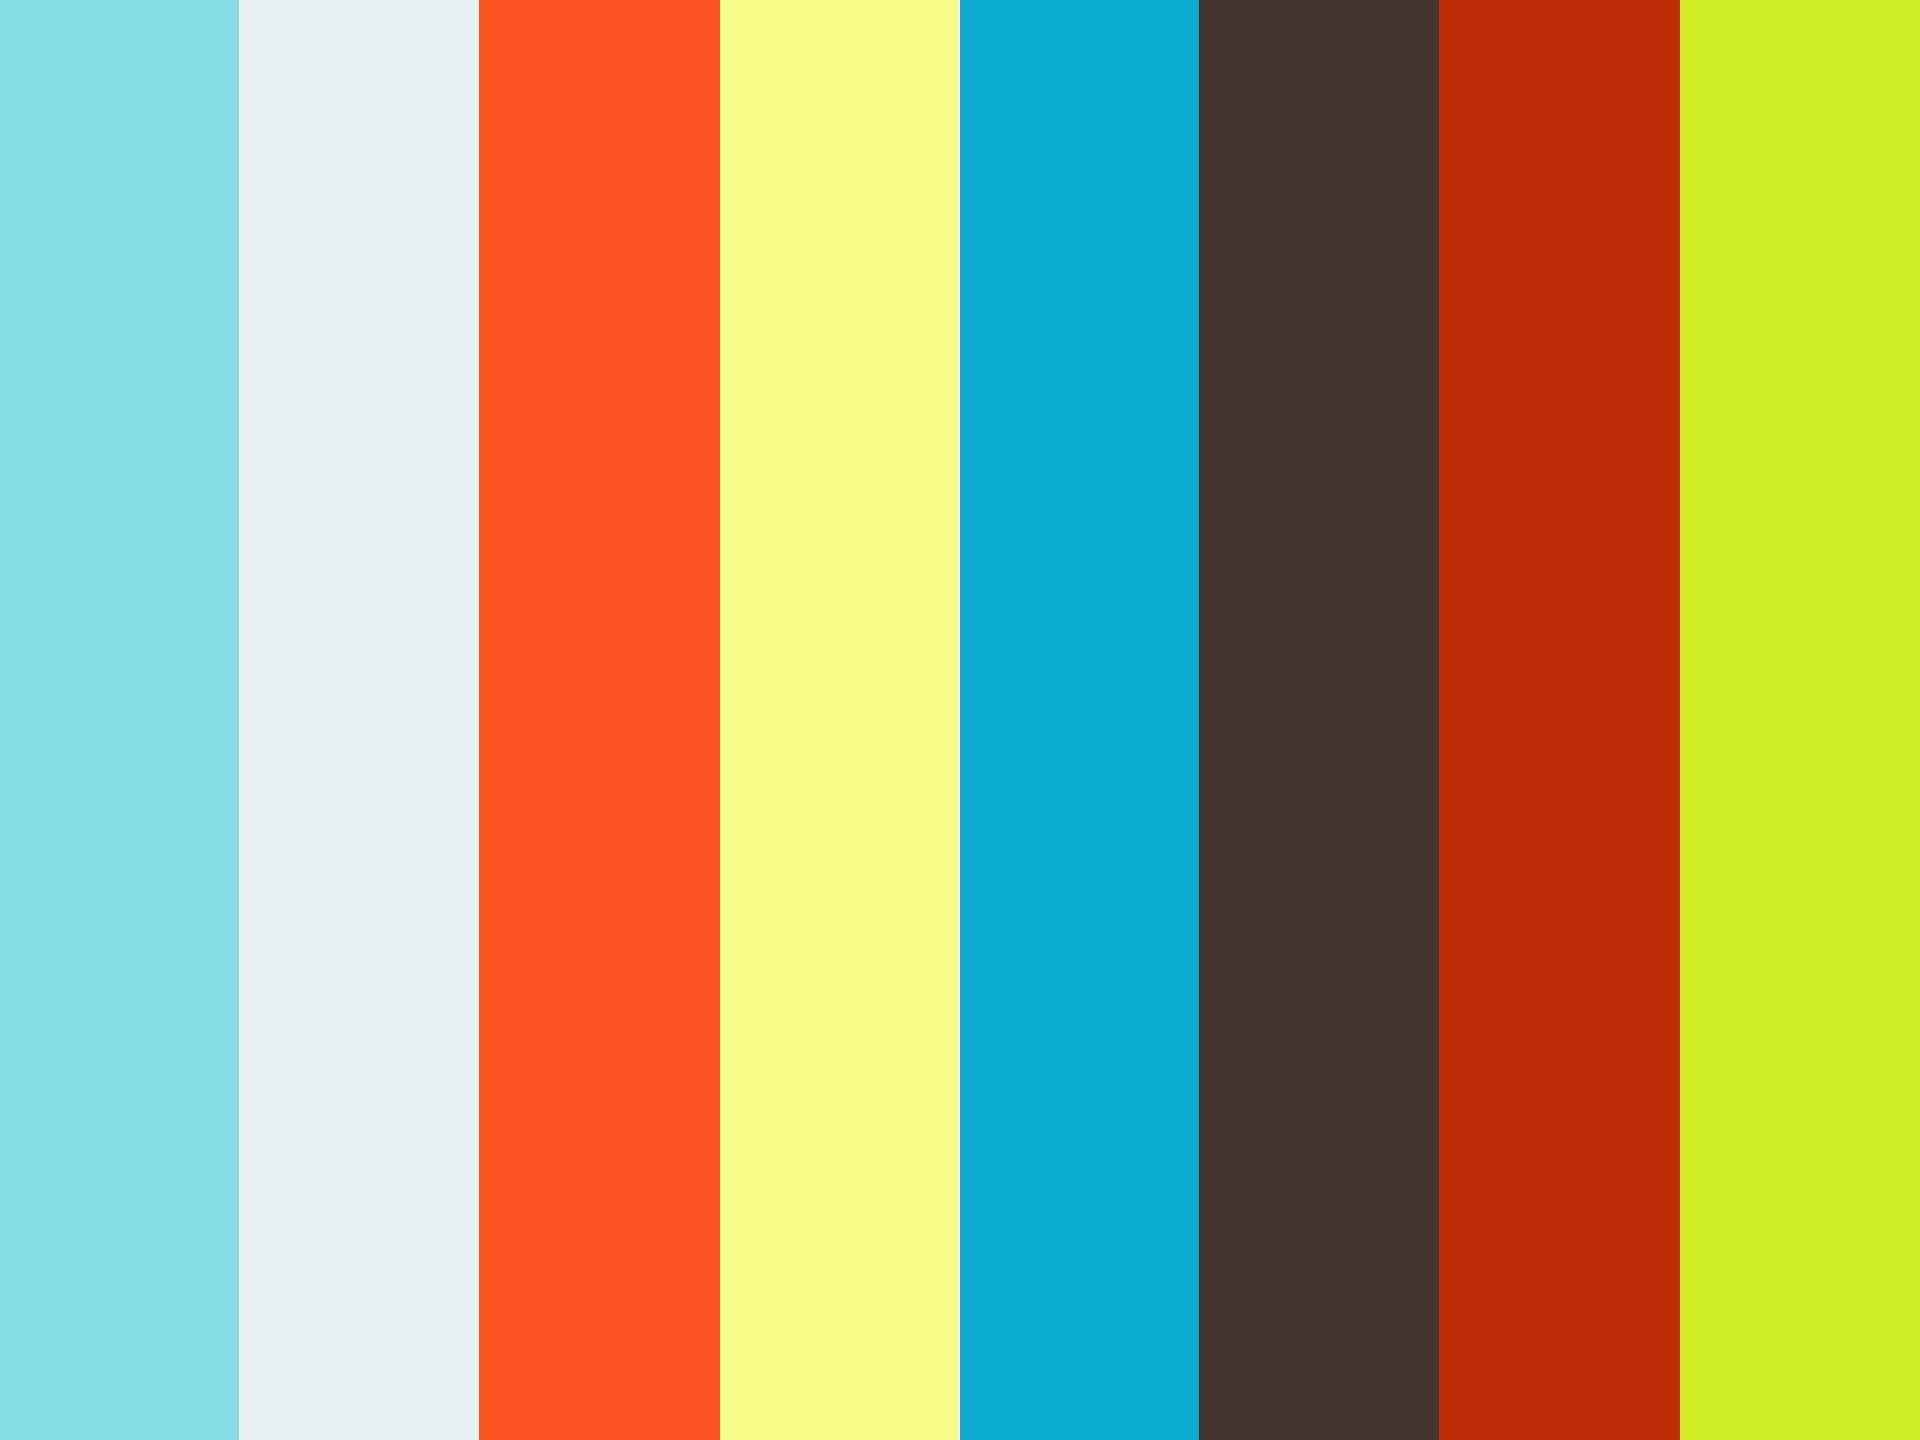 PHARAOH BLACK SIEMENS PROD BY FROZENGANGBEATZ СКАЧАТЬ БЕСПЛАТНО